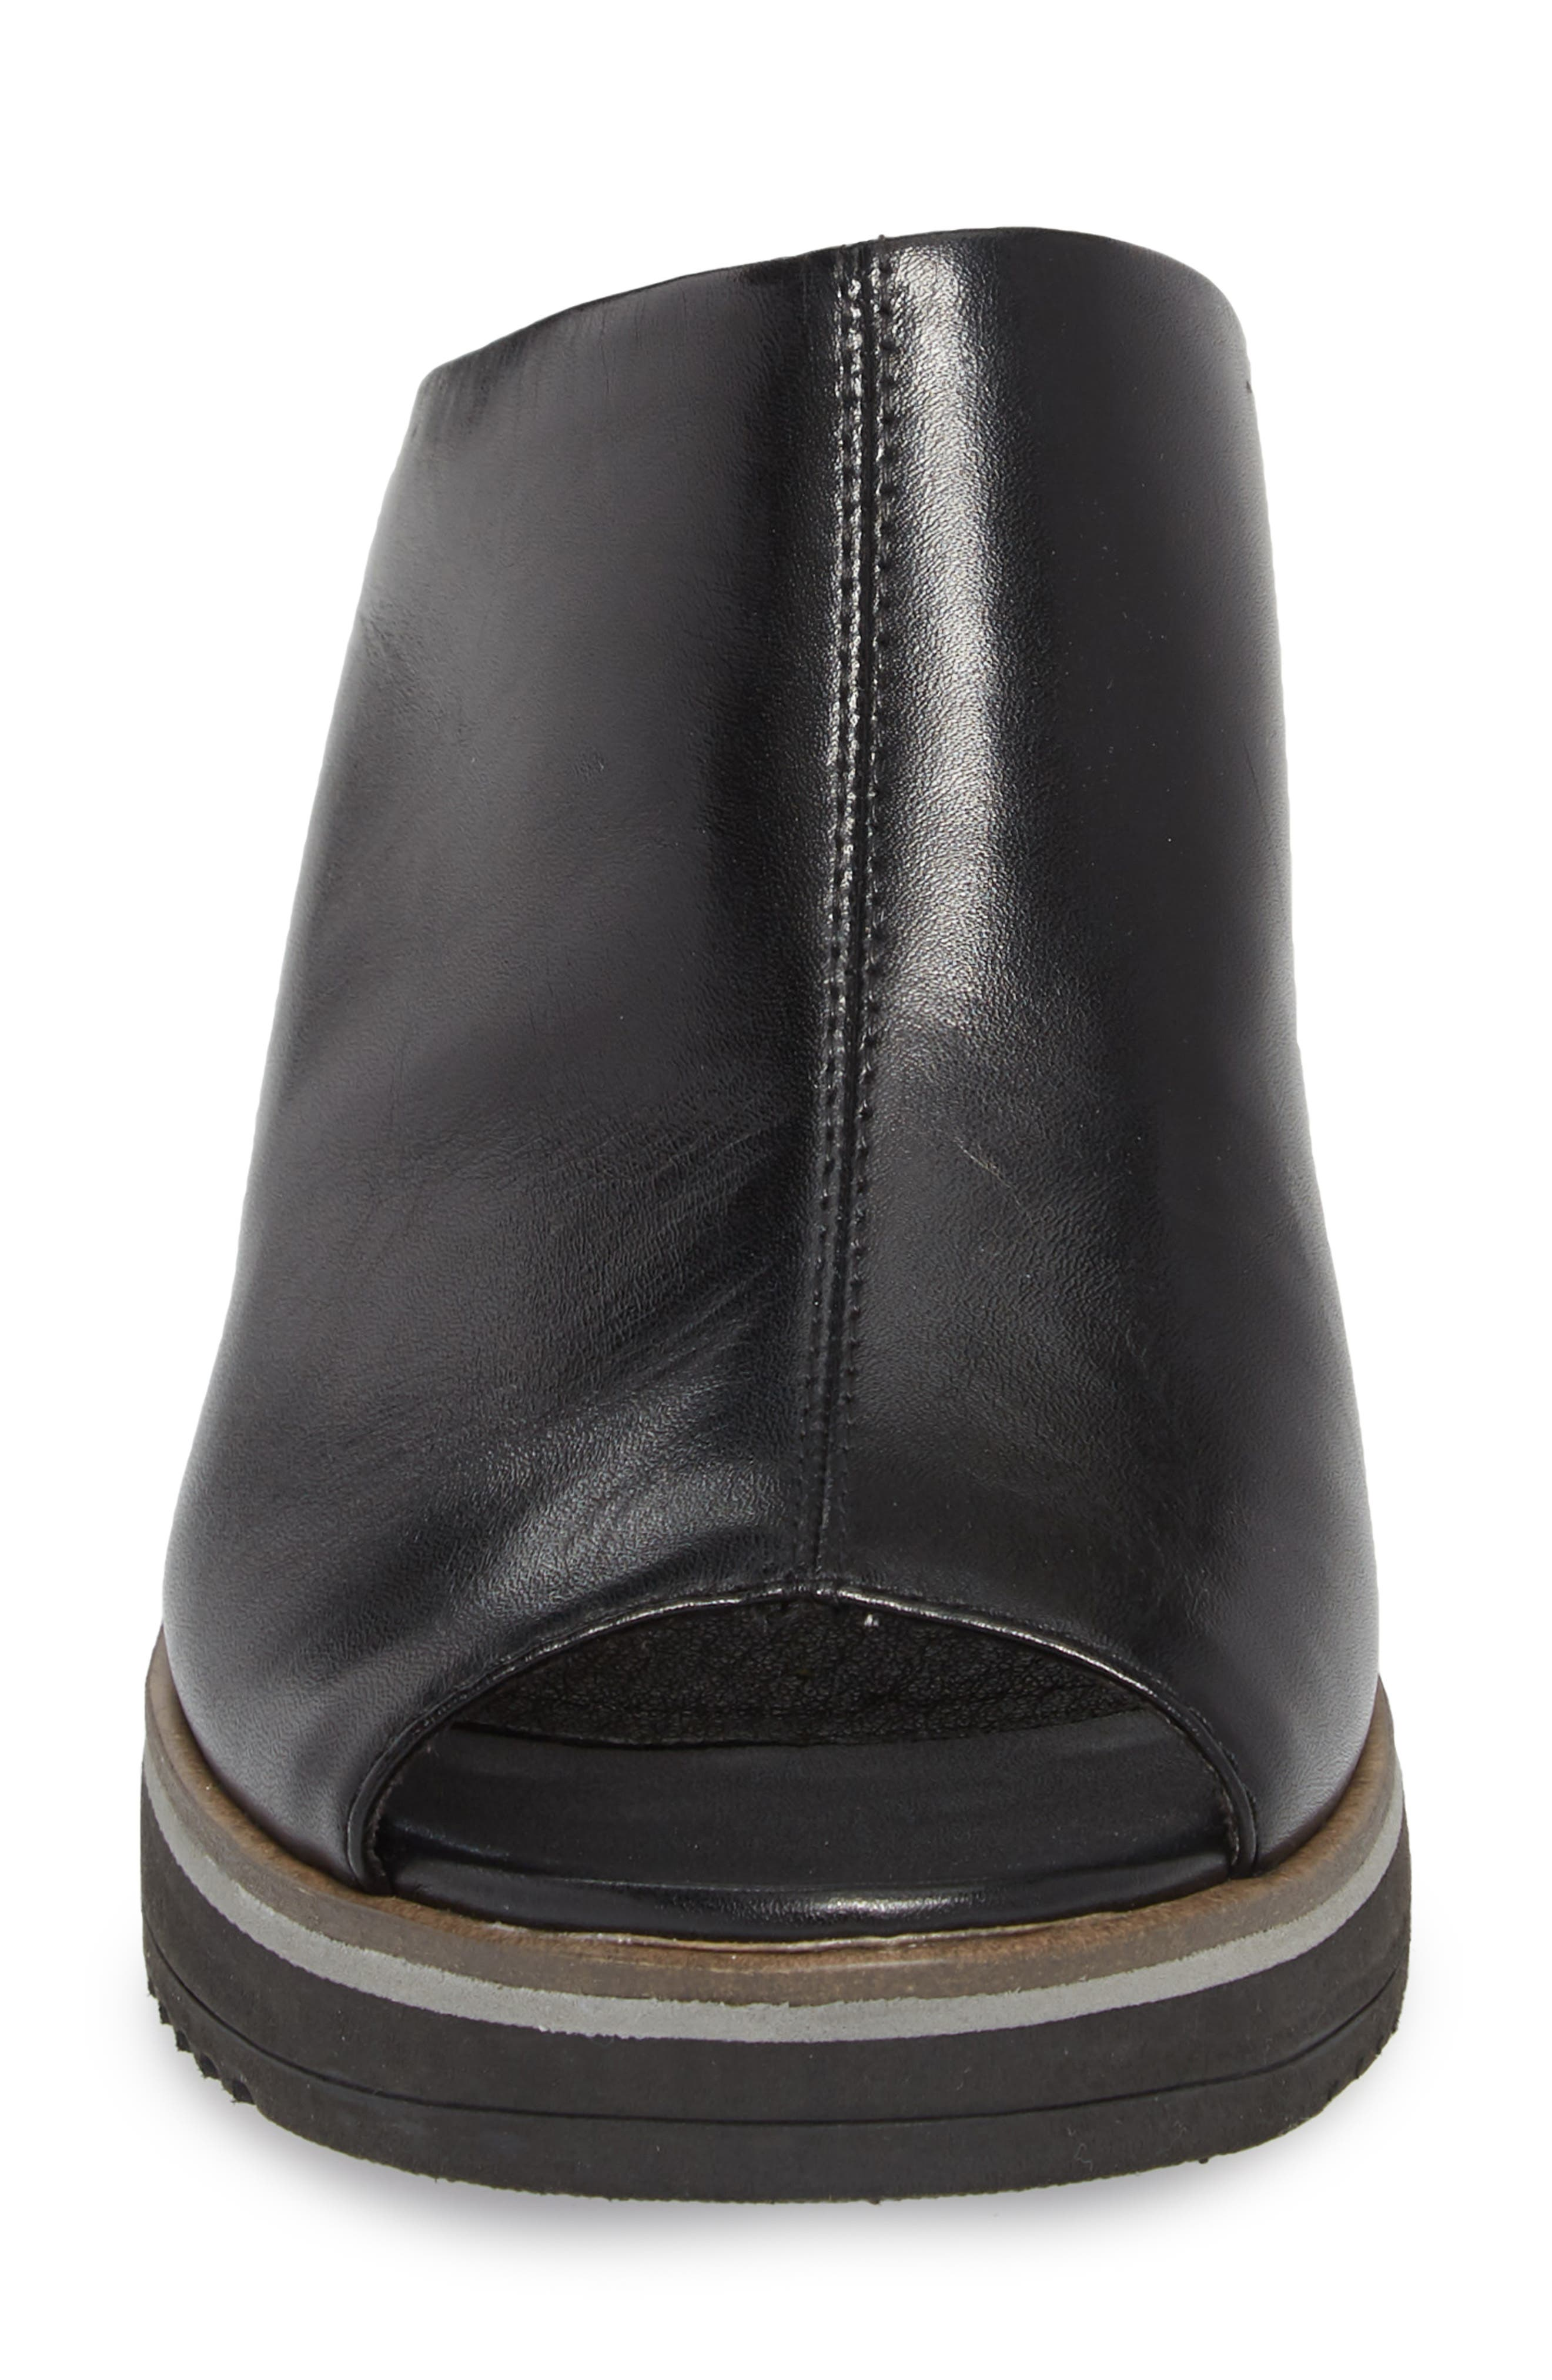 Alis Wedge Sandal,                             Alternate thumbnail 4, color,                             Black/ Black Leather